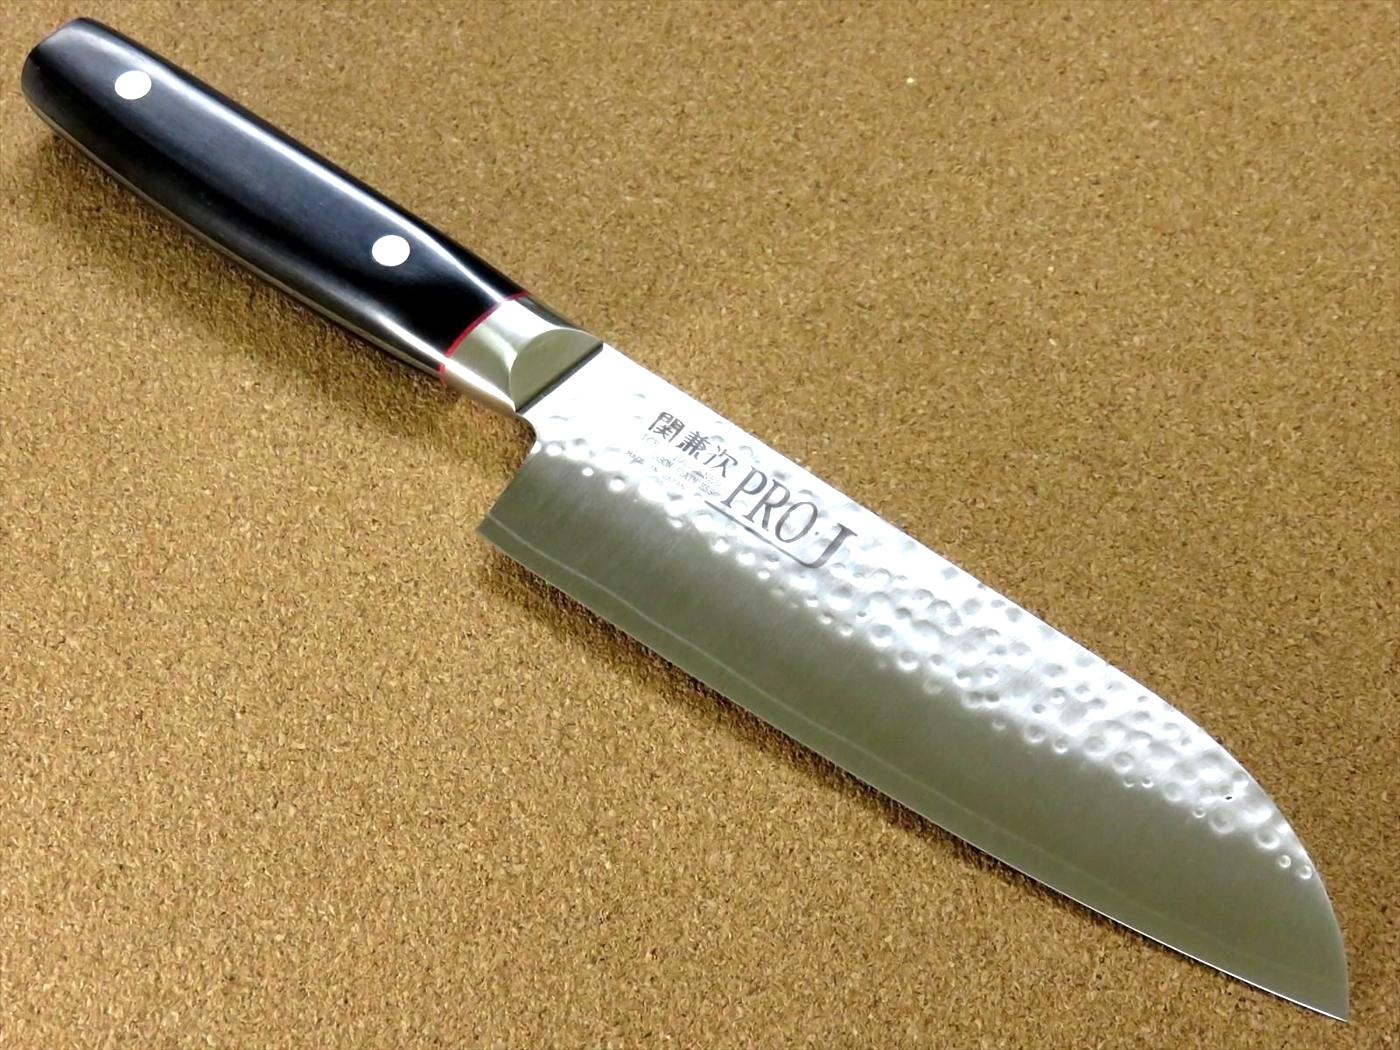 Фото 5 - Кухонный нож Сантоку, Pro-J, Kanetsugu, 6003, сталь VG-10, в картонной коробке